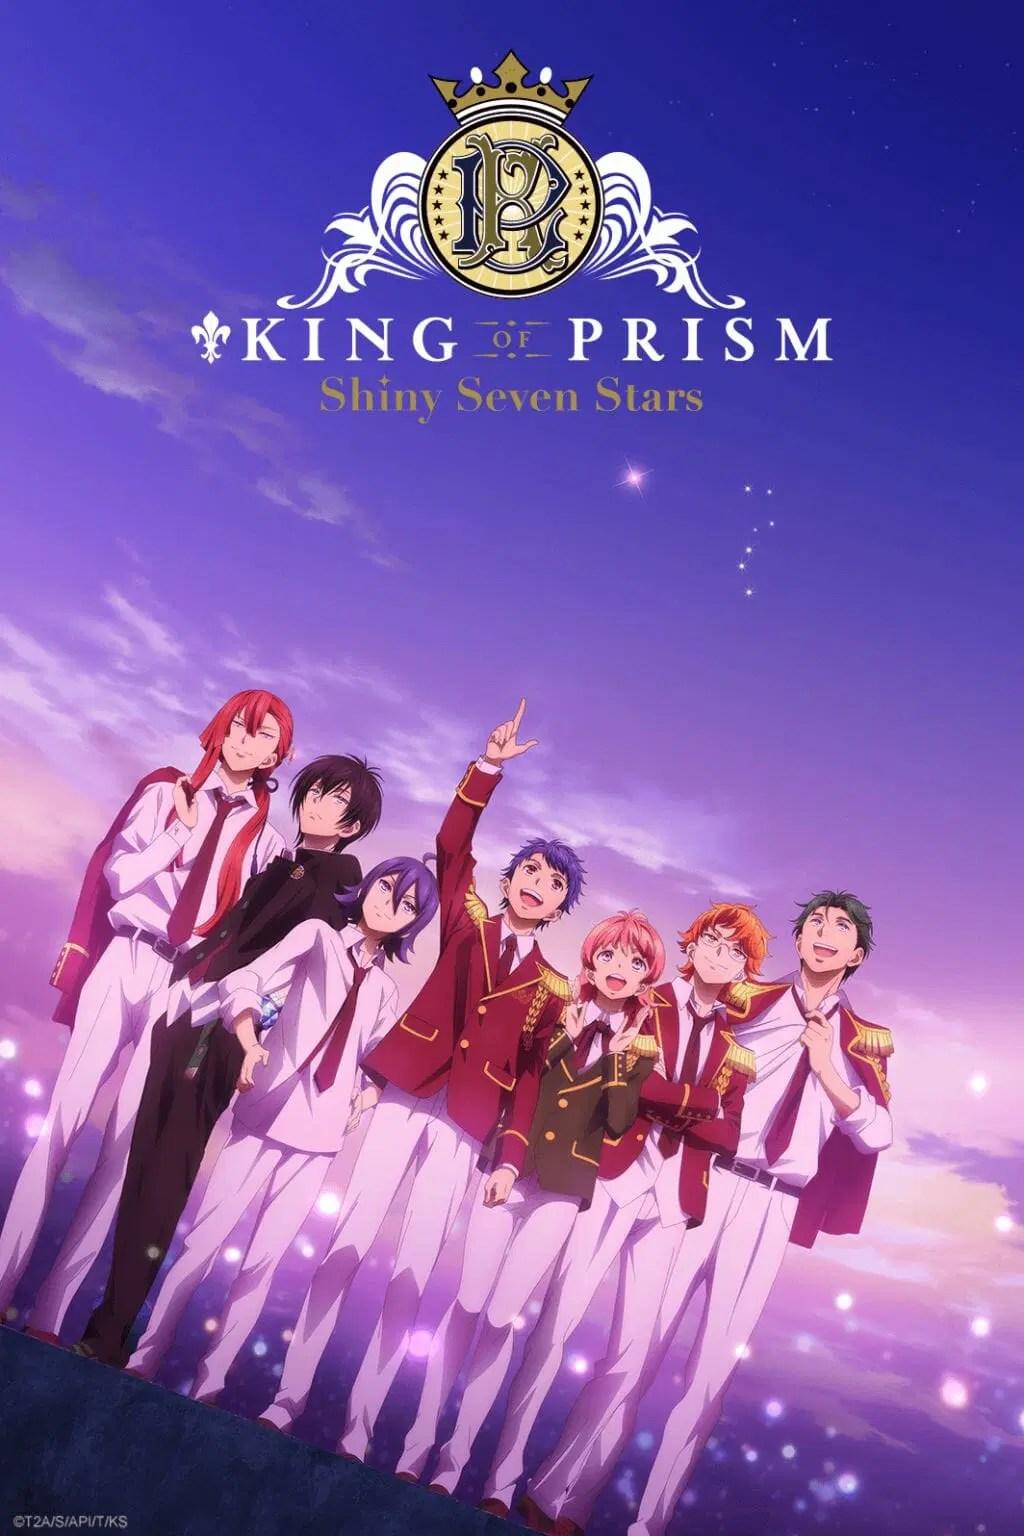 King of Prism Shiny Seven Stars Anime Visual